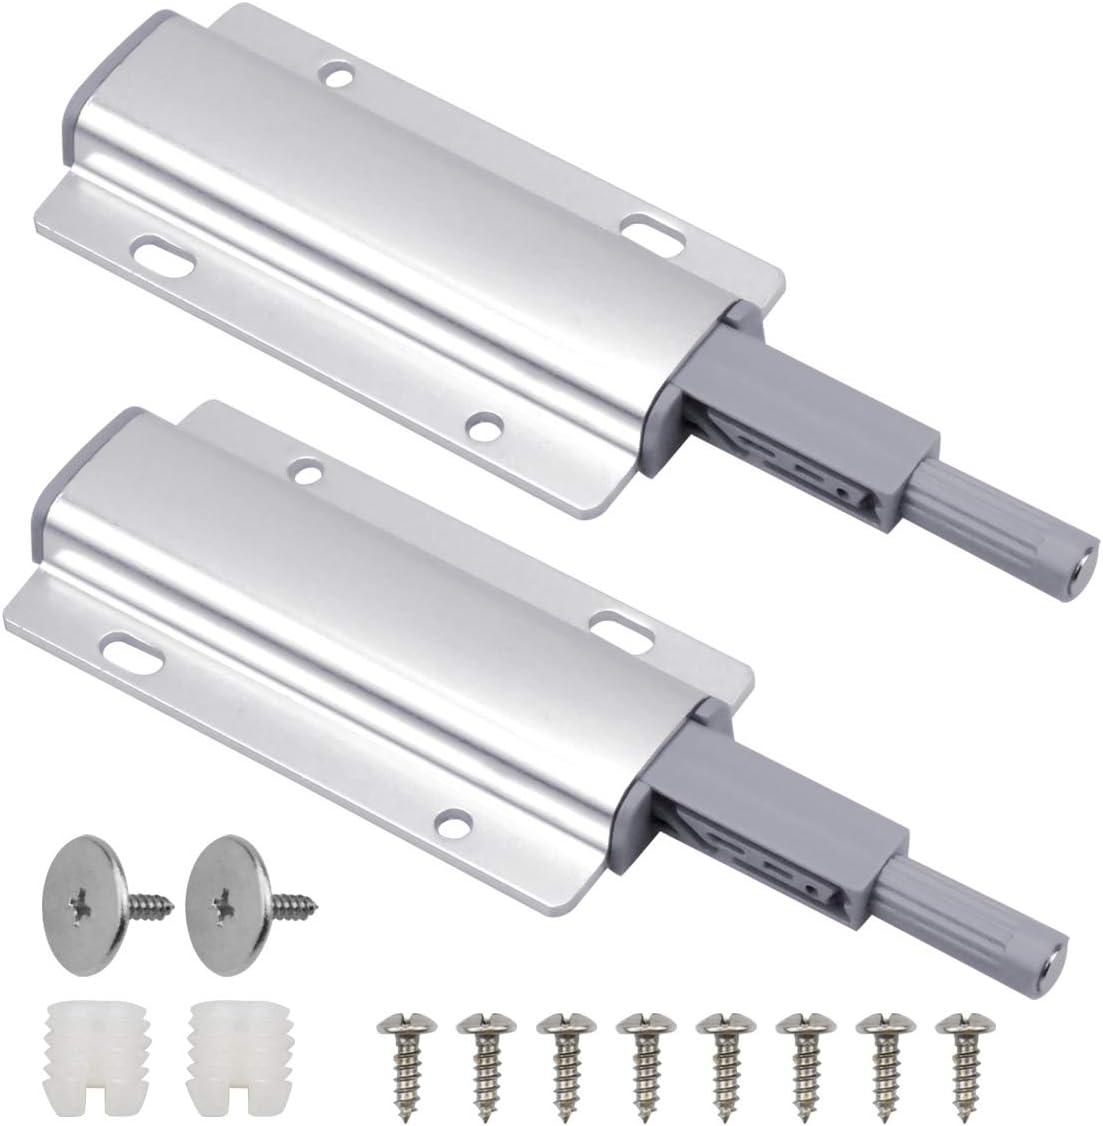 HQdeal 2 Pcs Amortiguador de Puerta Magn/éticos Push To Open System Damper Buffer Cierres Magn/éticos para Puertas de Armario